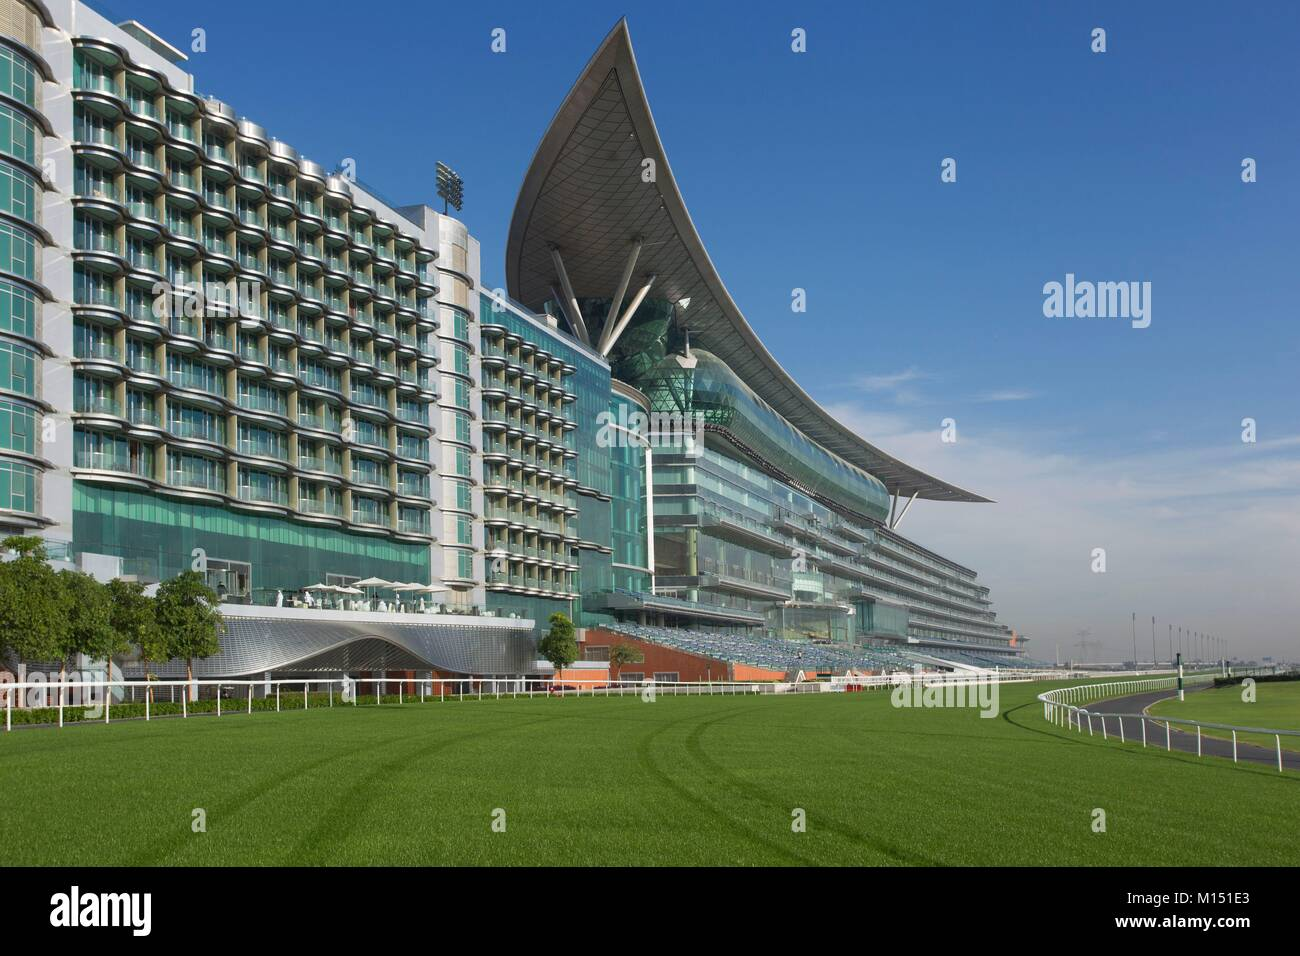 United Arab Emirates, Dubai, Meydan Race course - Stock Image